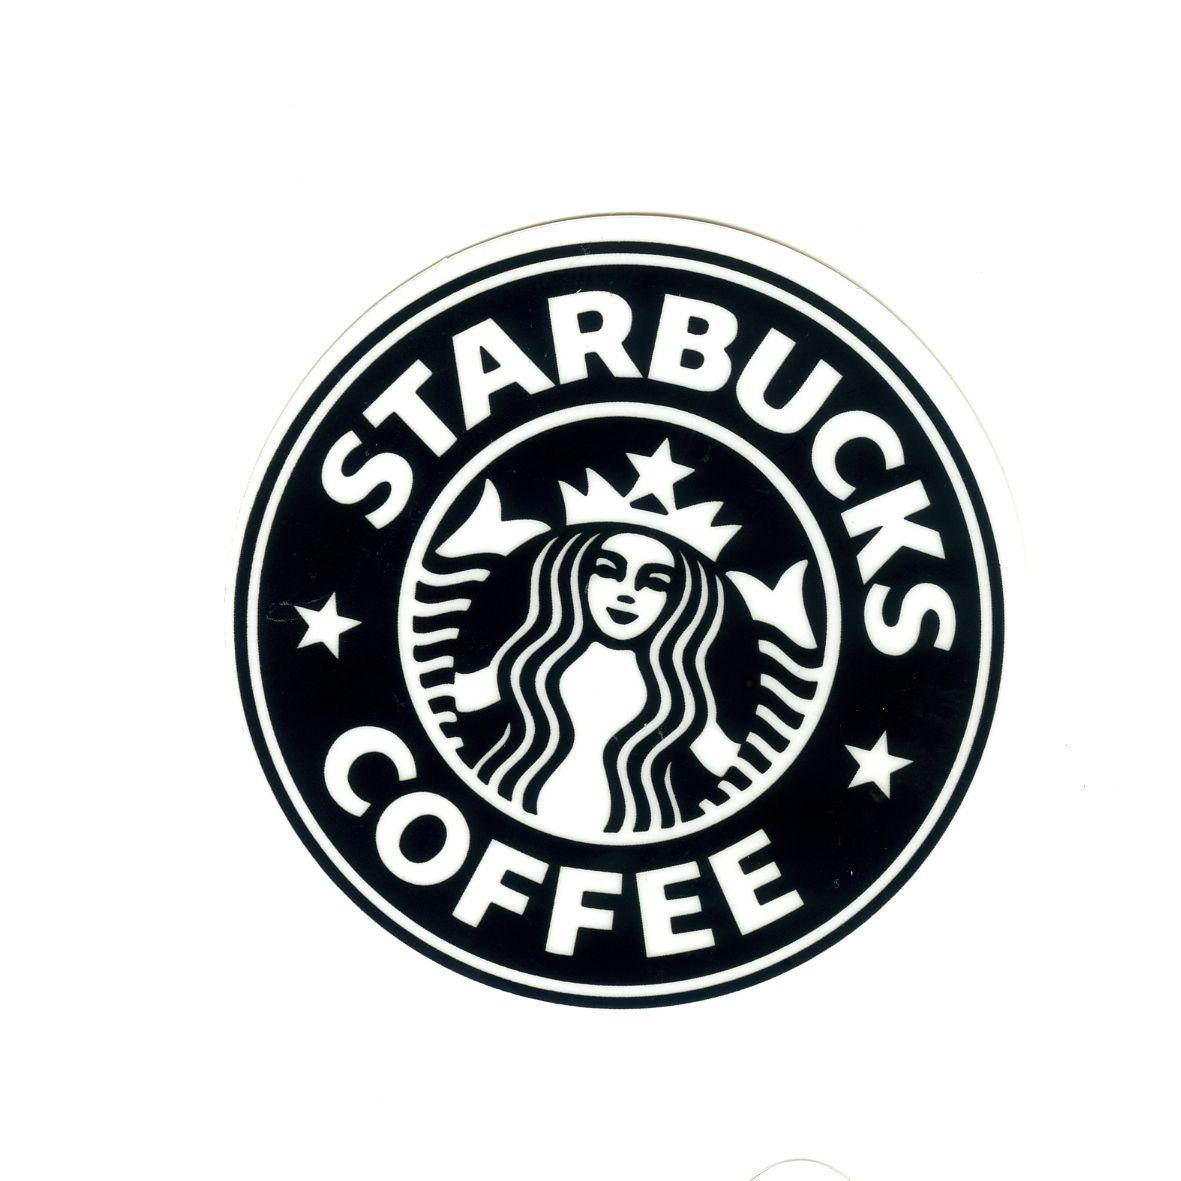 картинки логотипа кофе старбакс